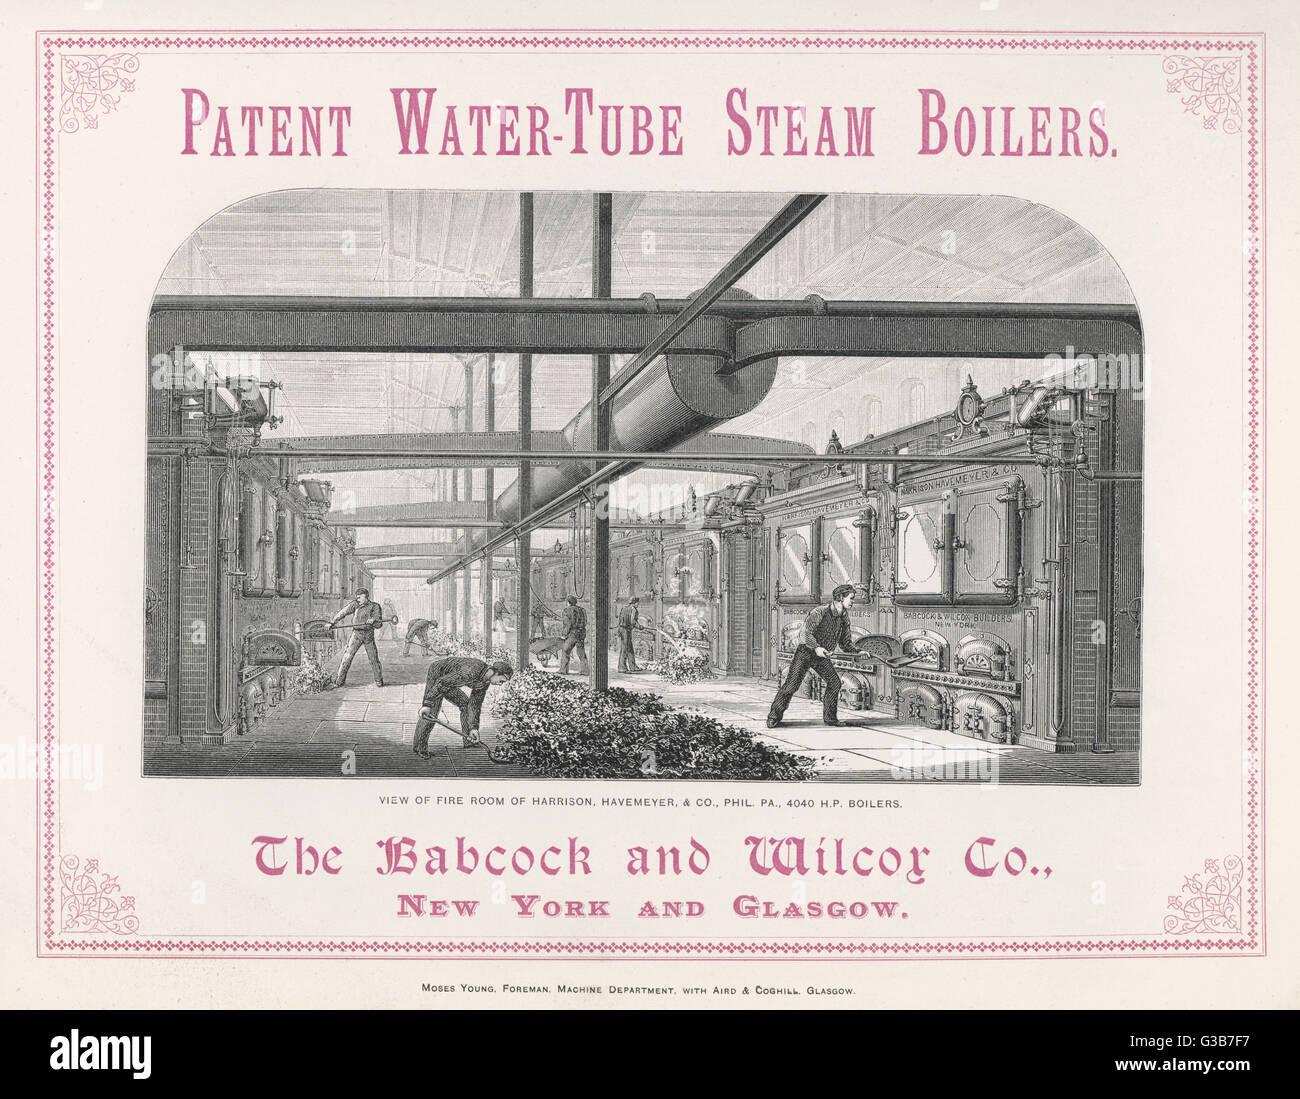 Patent Date Stockfotos & Patent Date Bilder - Alamy